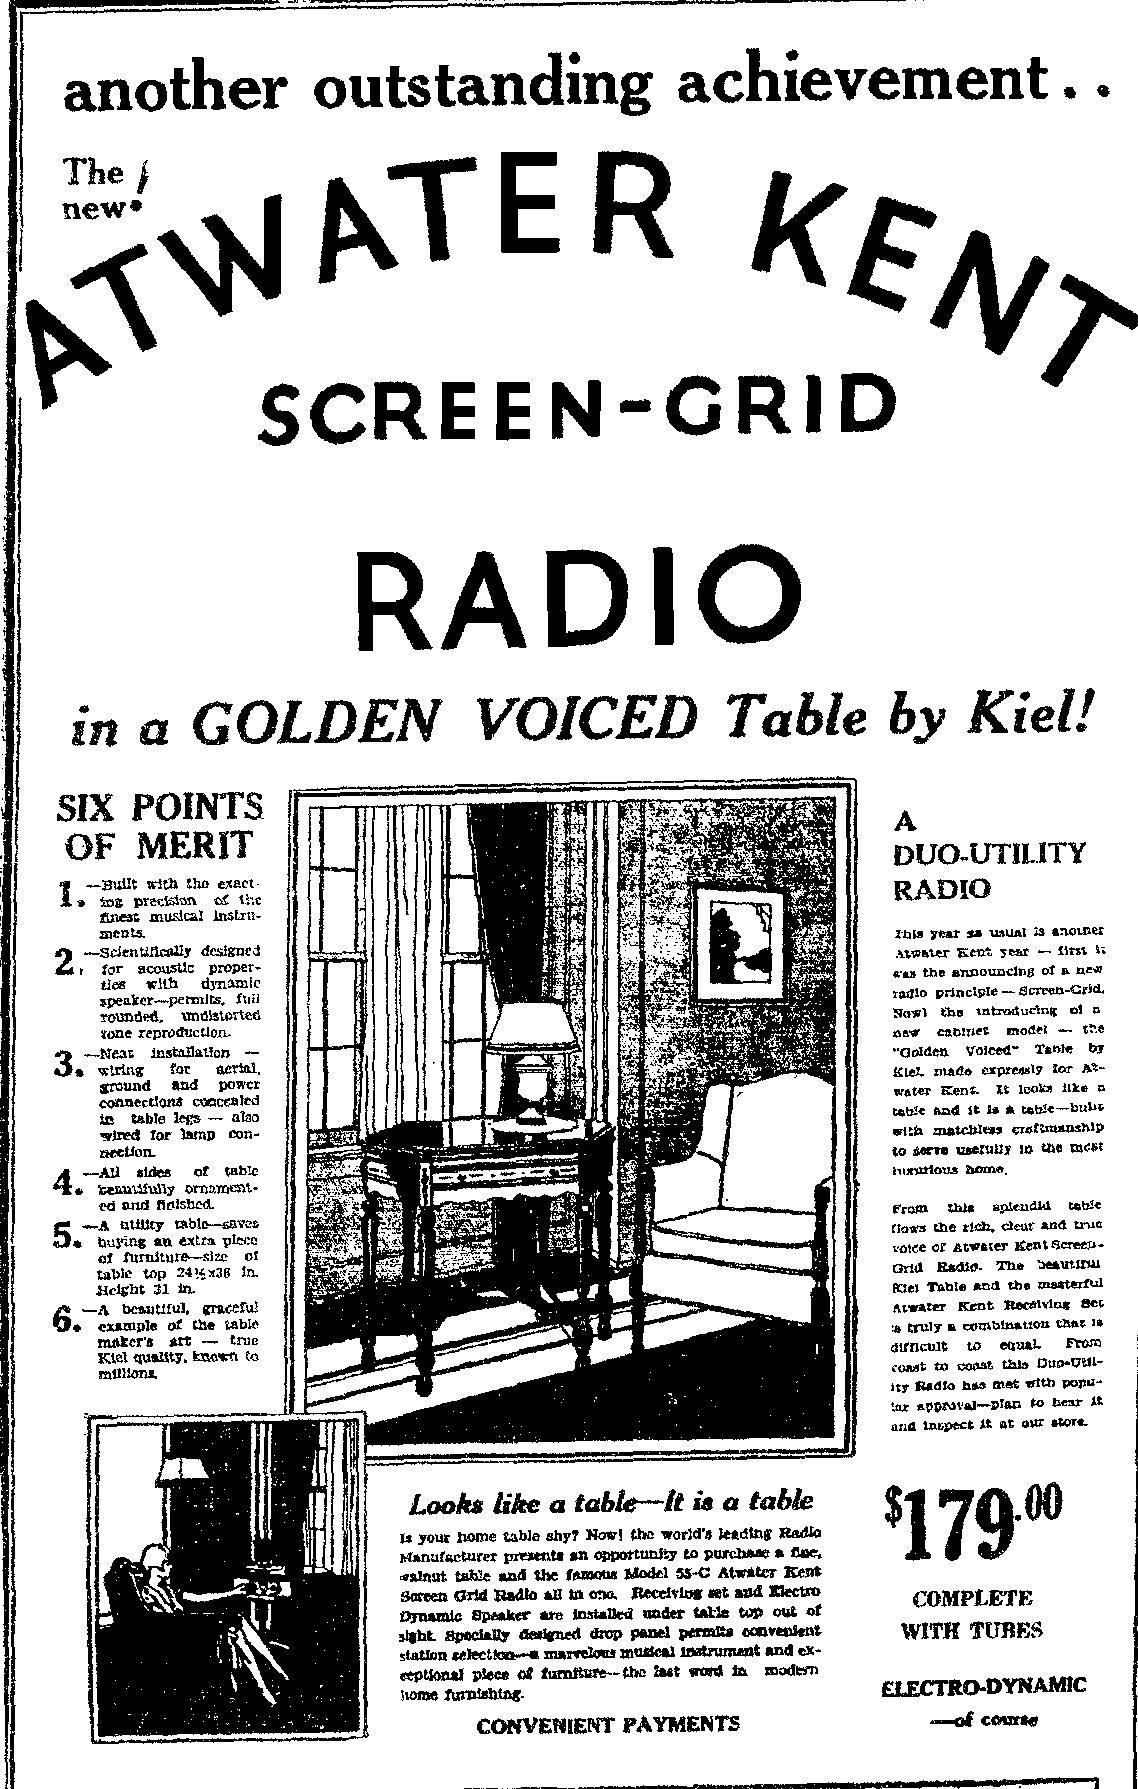 Atwater Kent Model 55c Radio In Kiel Table